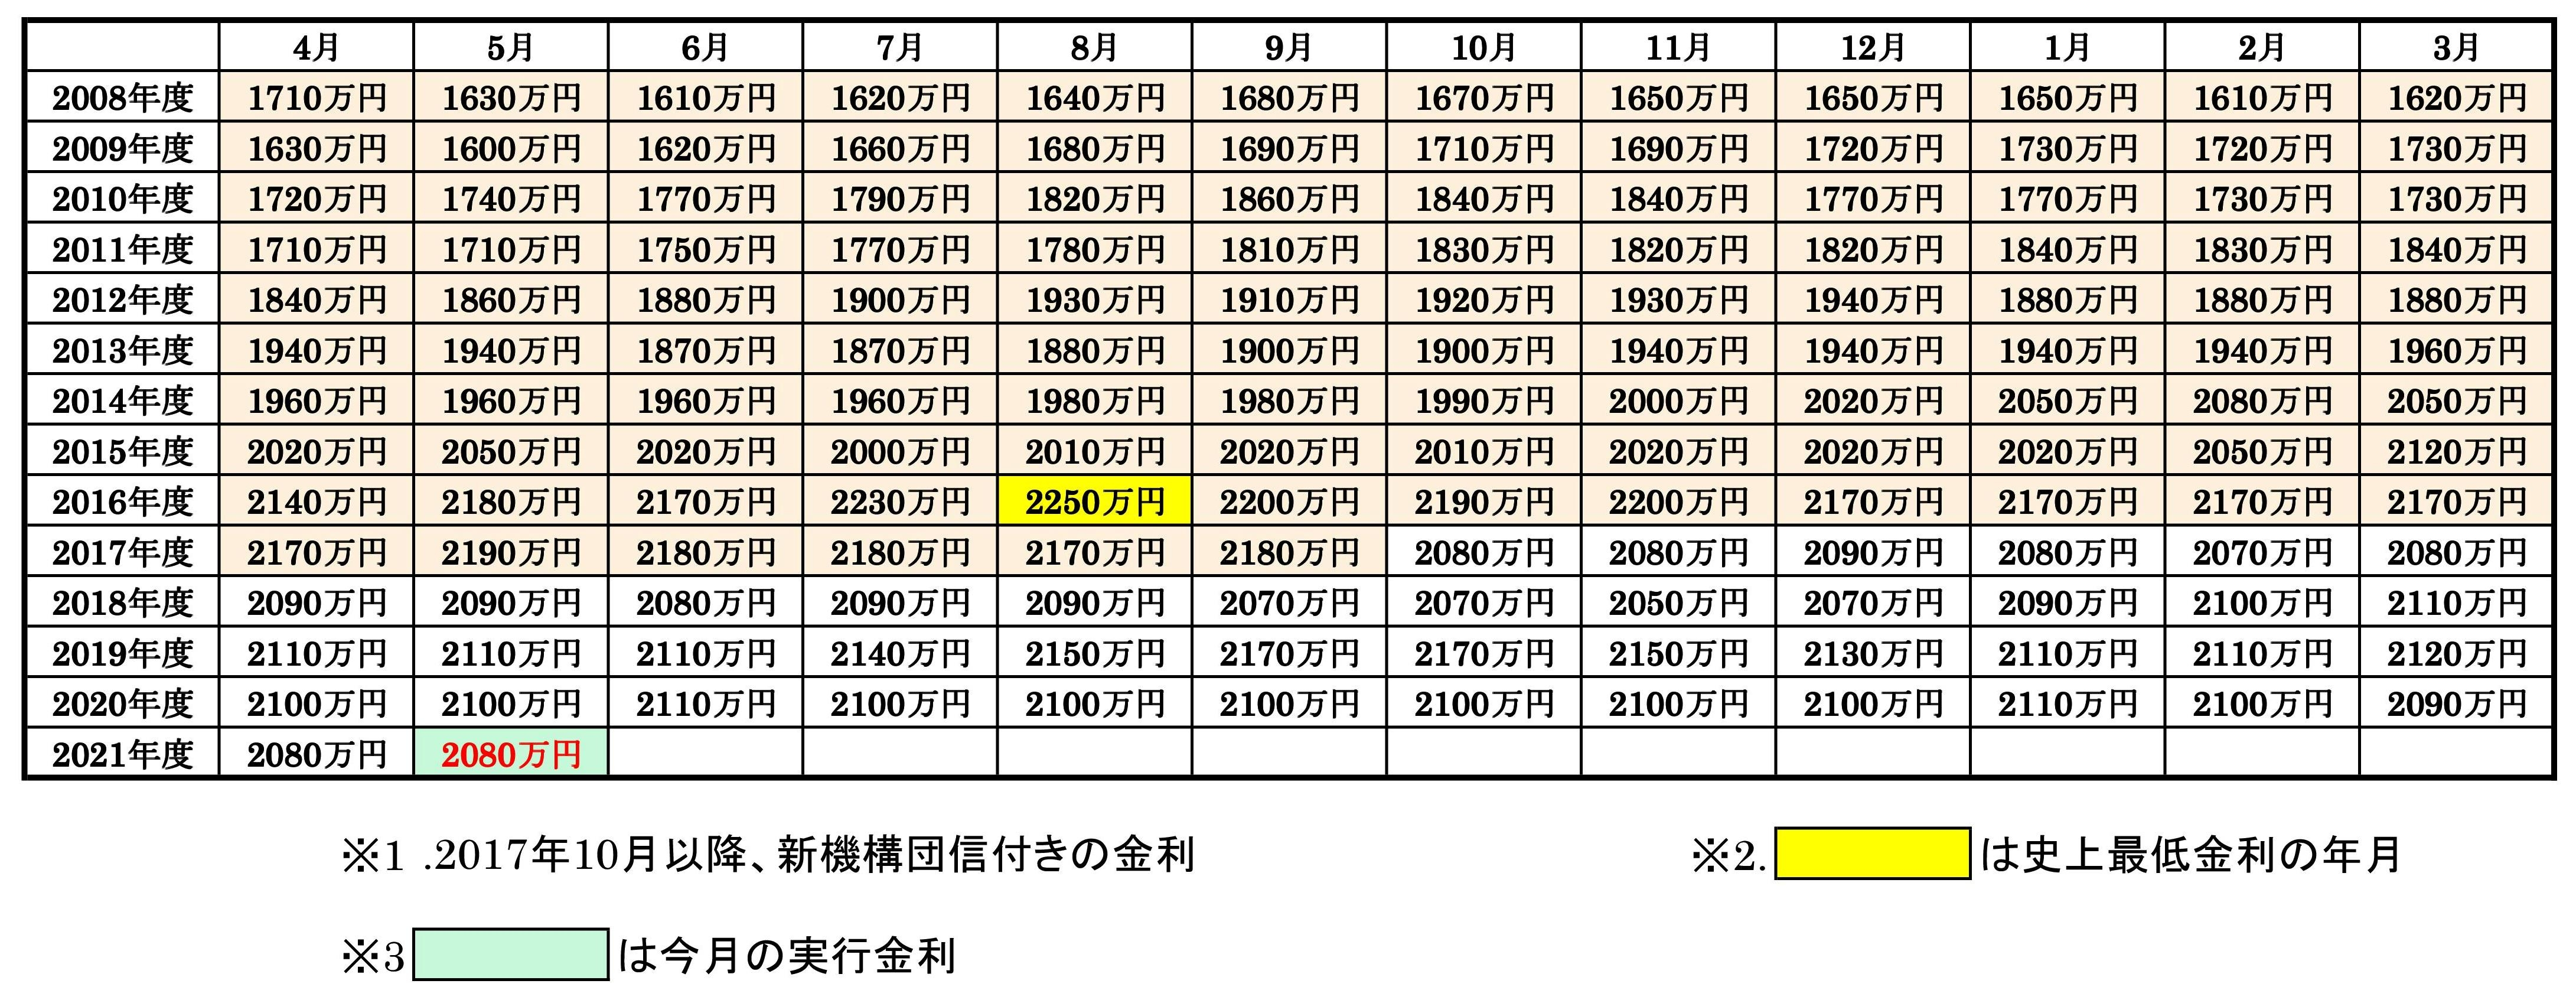 20210501kinri (5).jpg